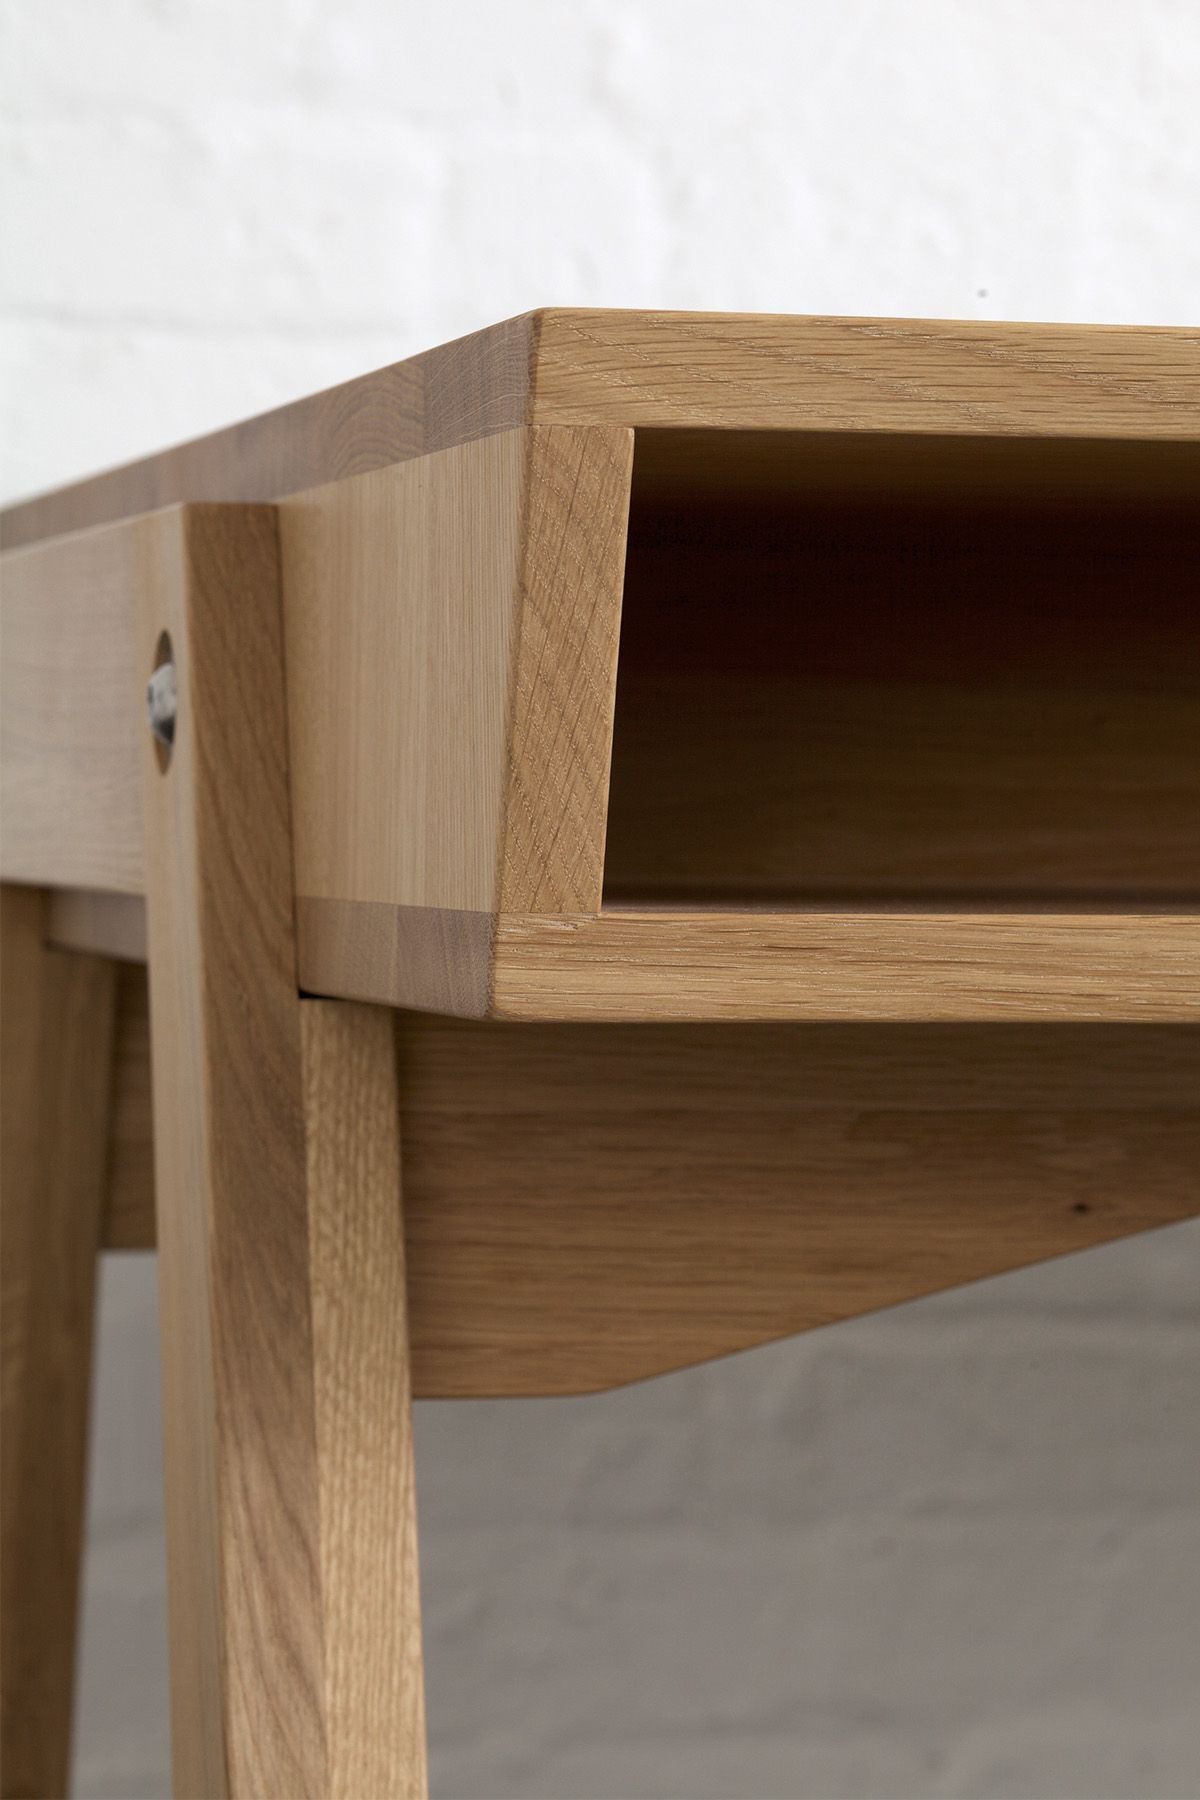 Fabrikate Stubenrauch Hamburg Diy Holz Holzdesign Kleinmobel